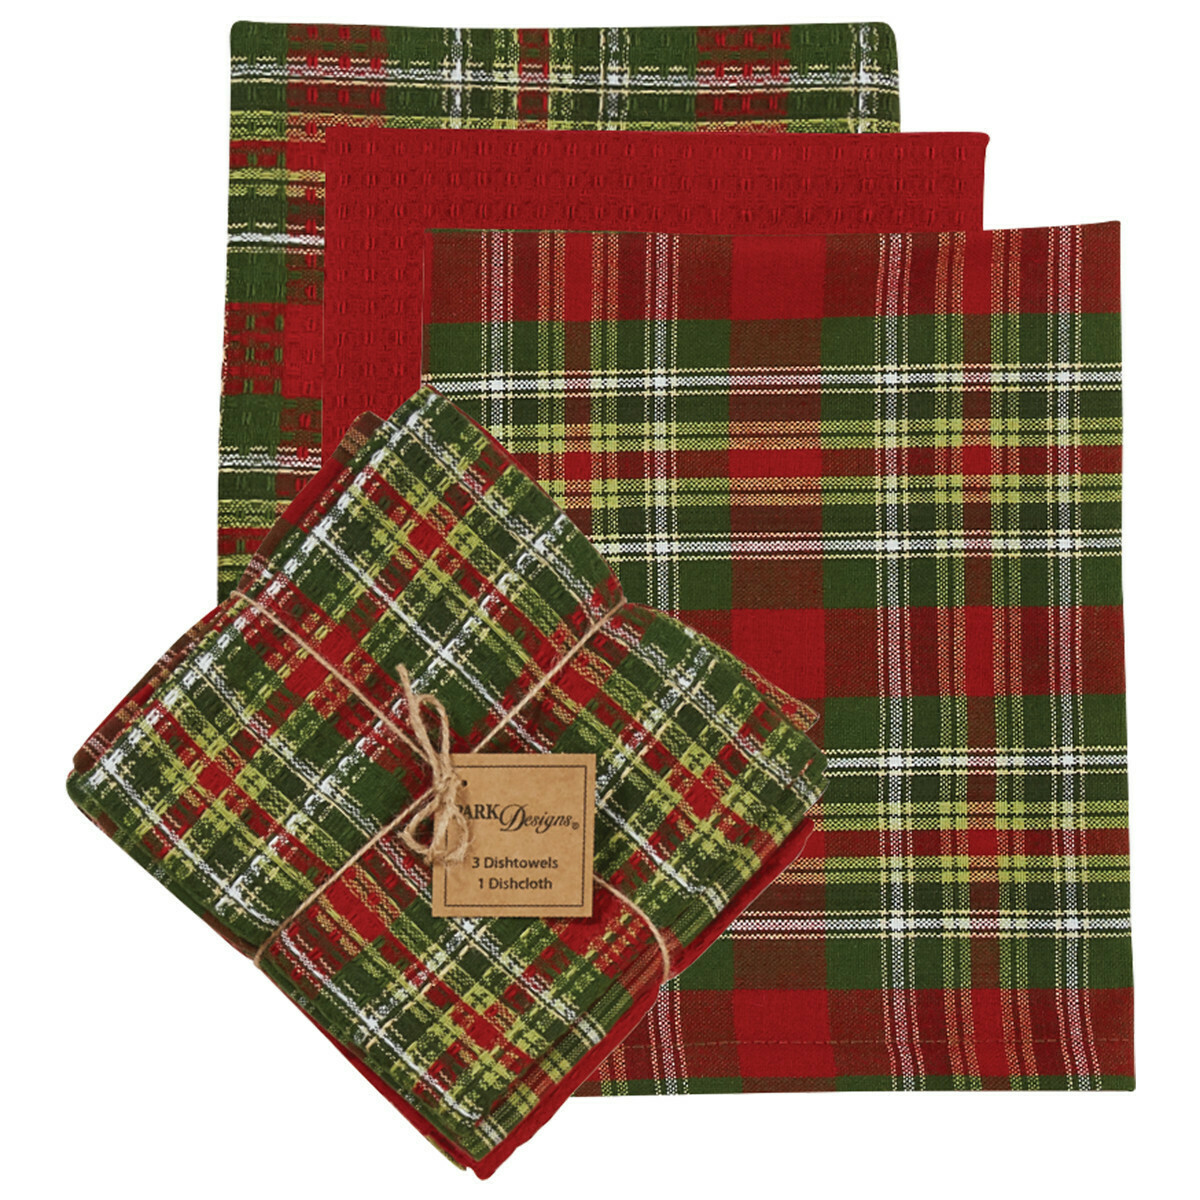 Greenhow Tartan 3 Dishtowel & 1 Dishcloth Set